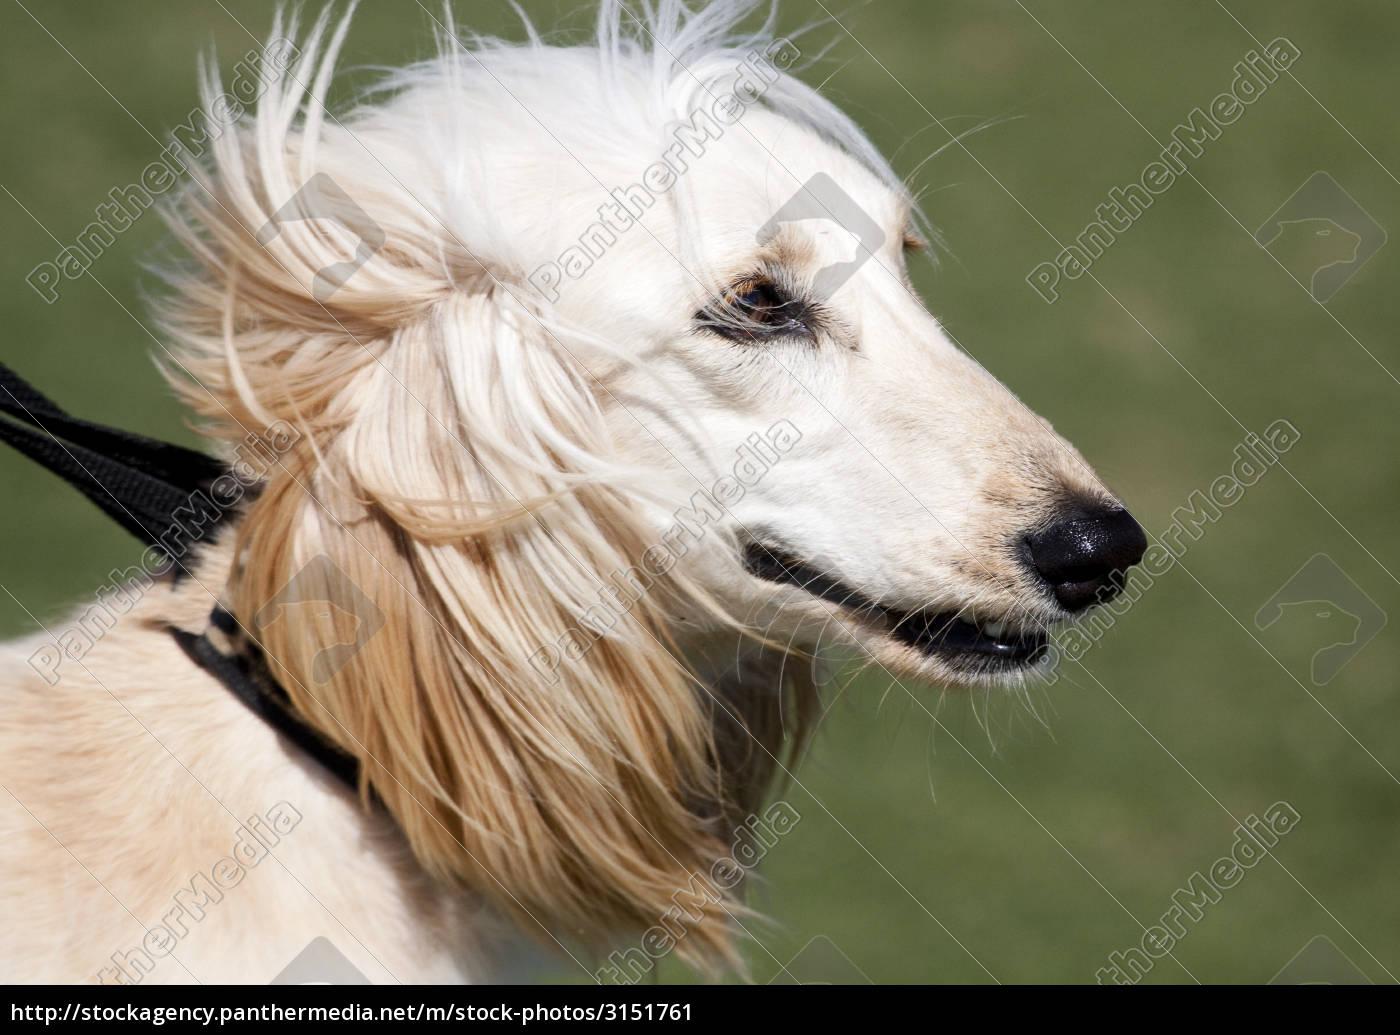 afghan, hound - 3151761